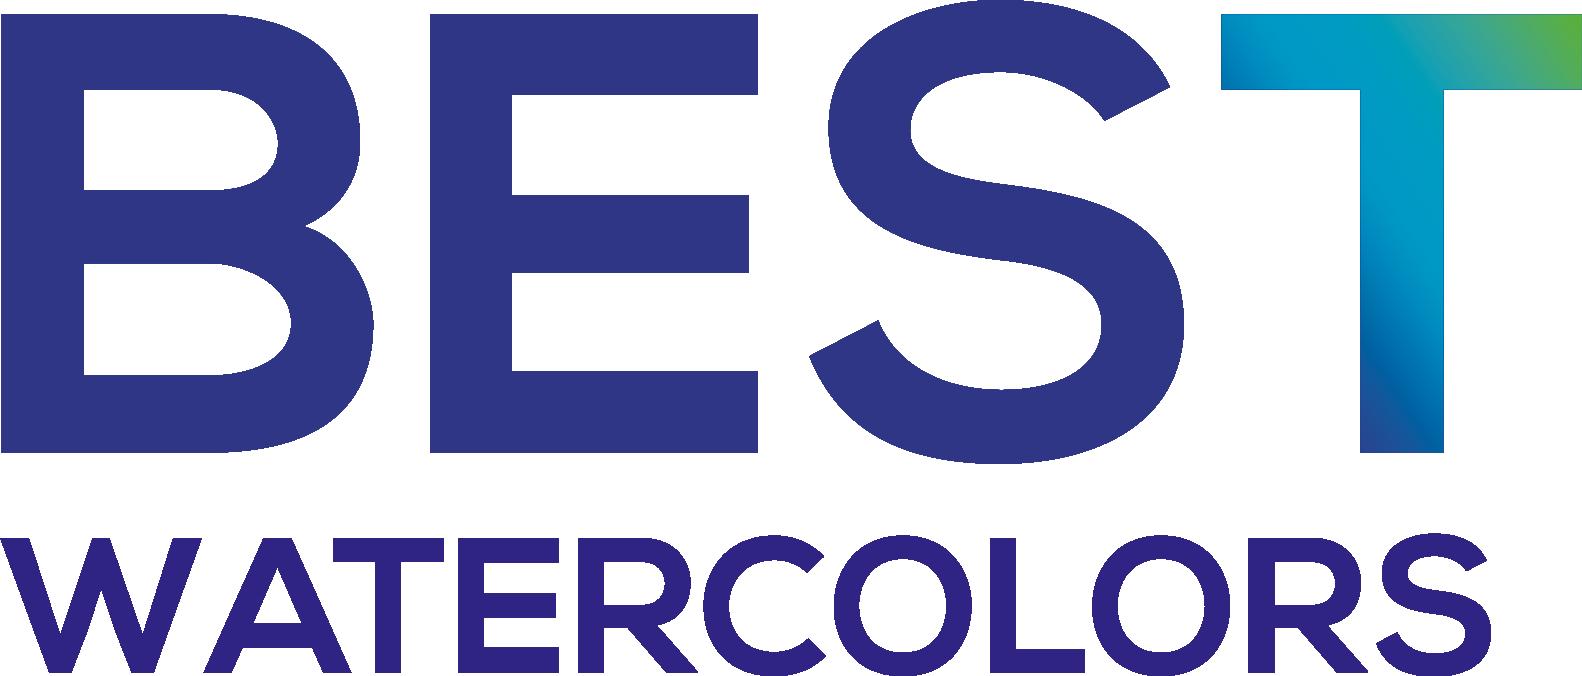 Bestwatercolors logo